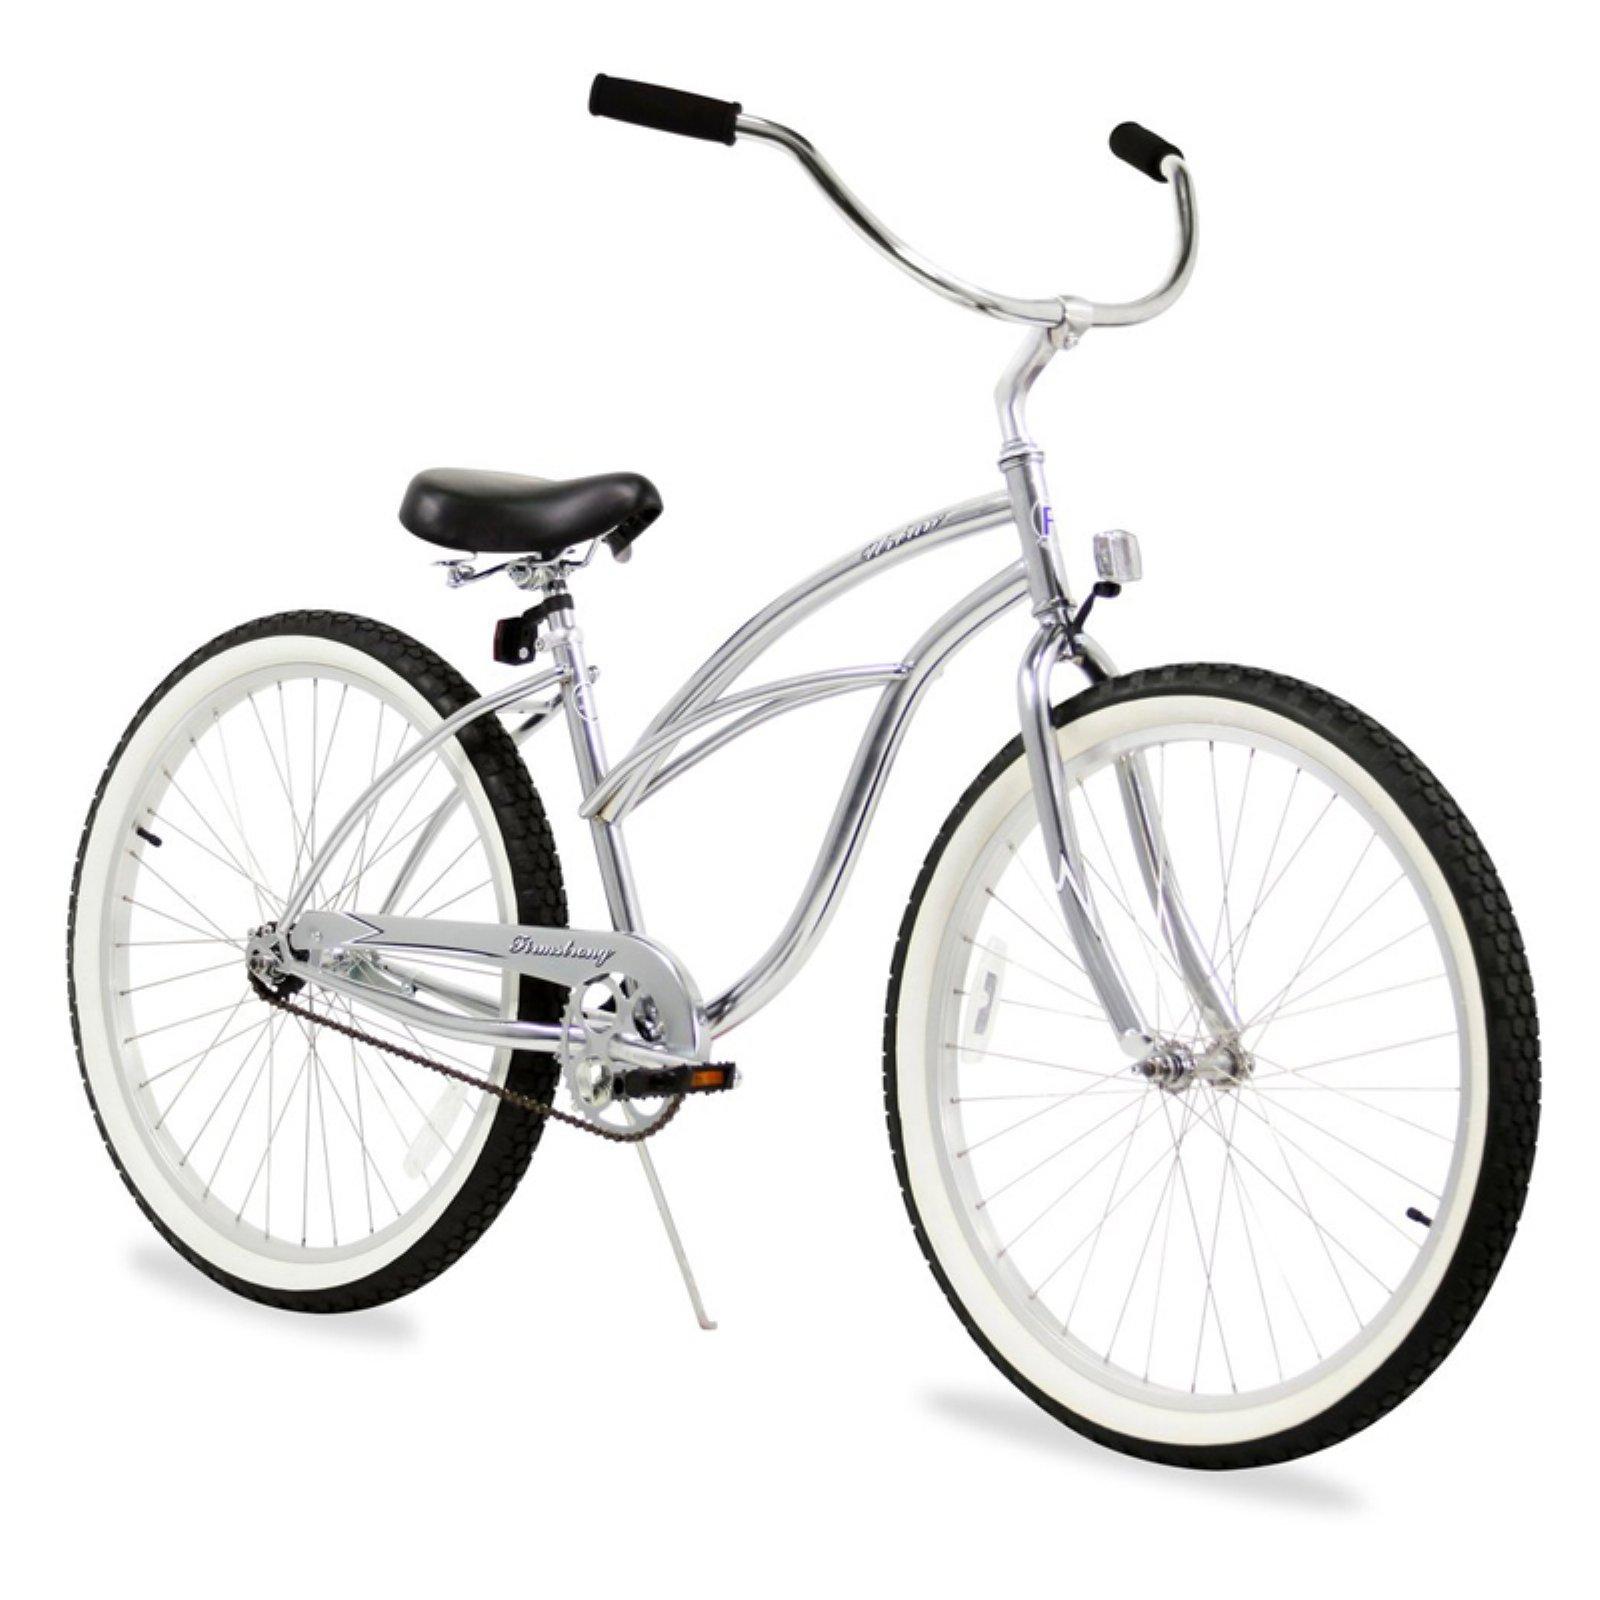 White Firmstrong Urban Lady Single Speed Women/'s 24 Inch Beach Cruiser Bike